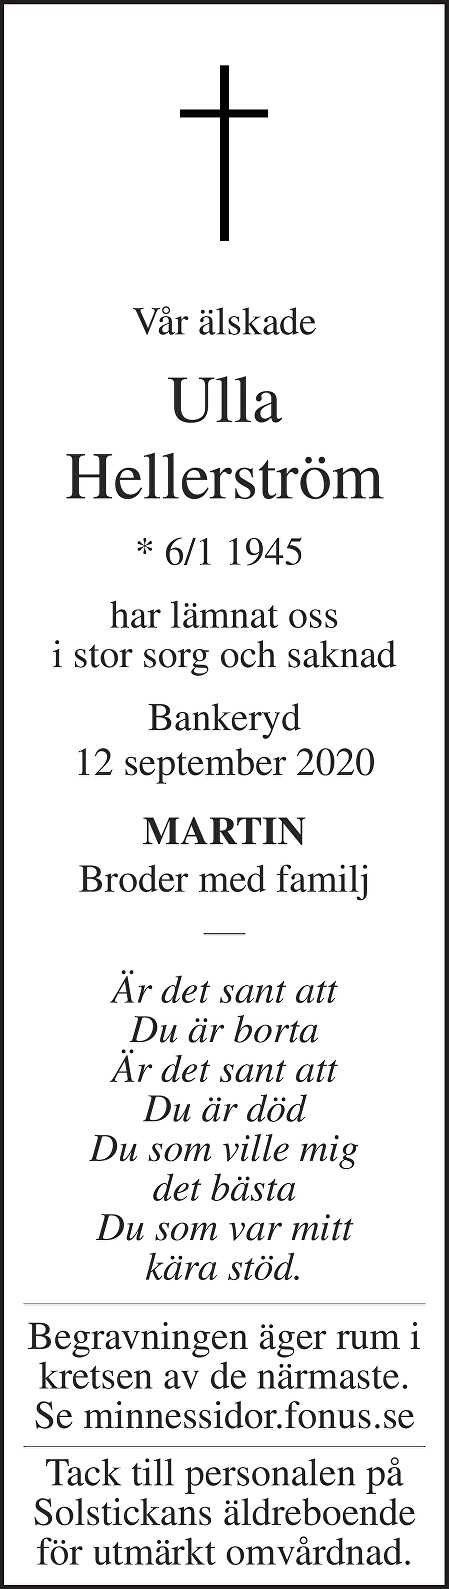 Ulla Hellerström Death notice